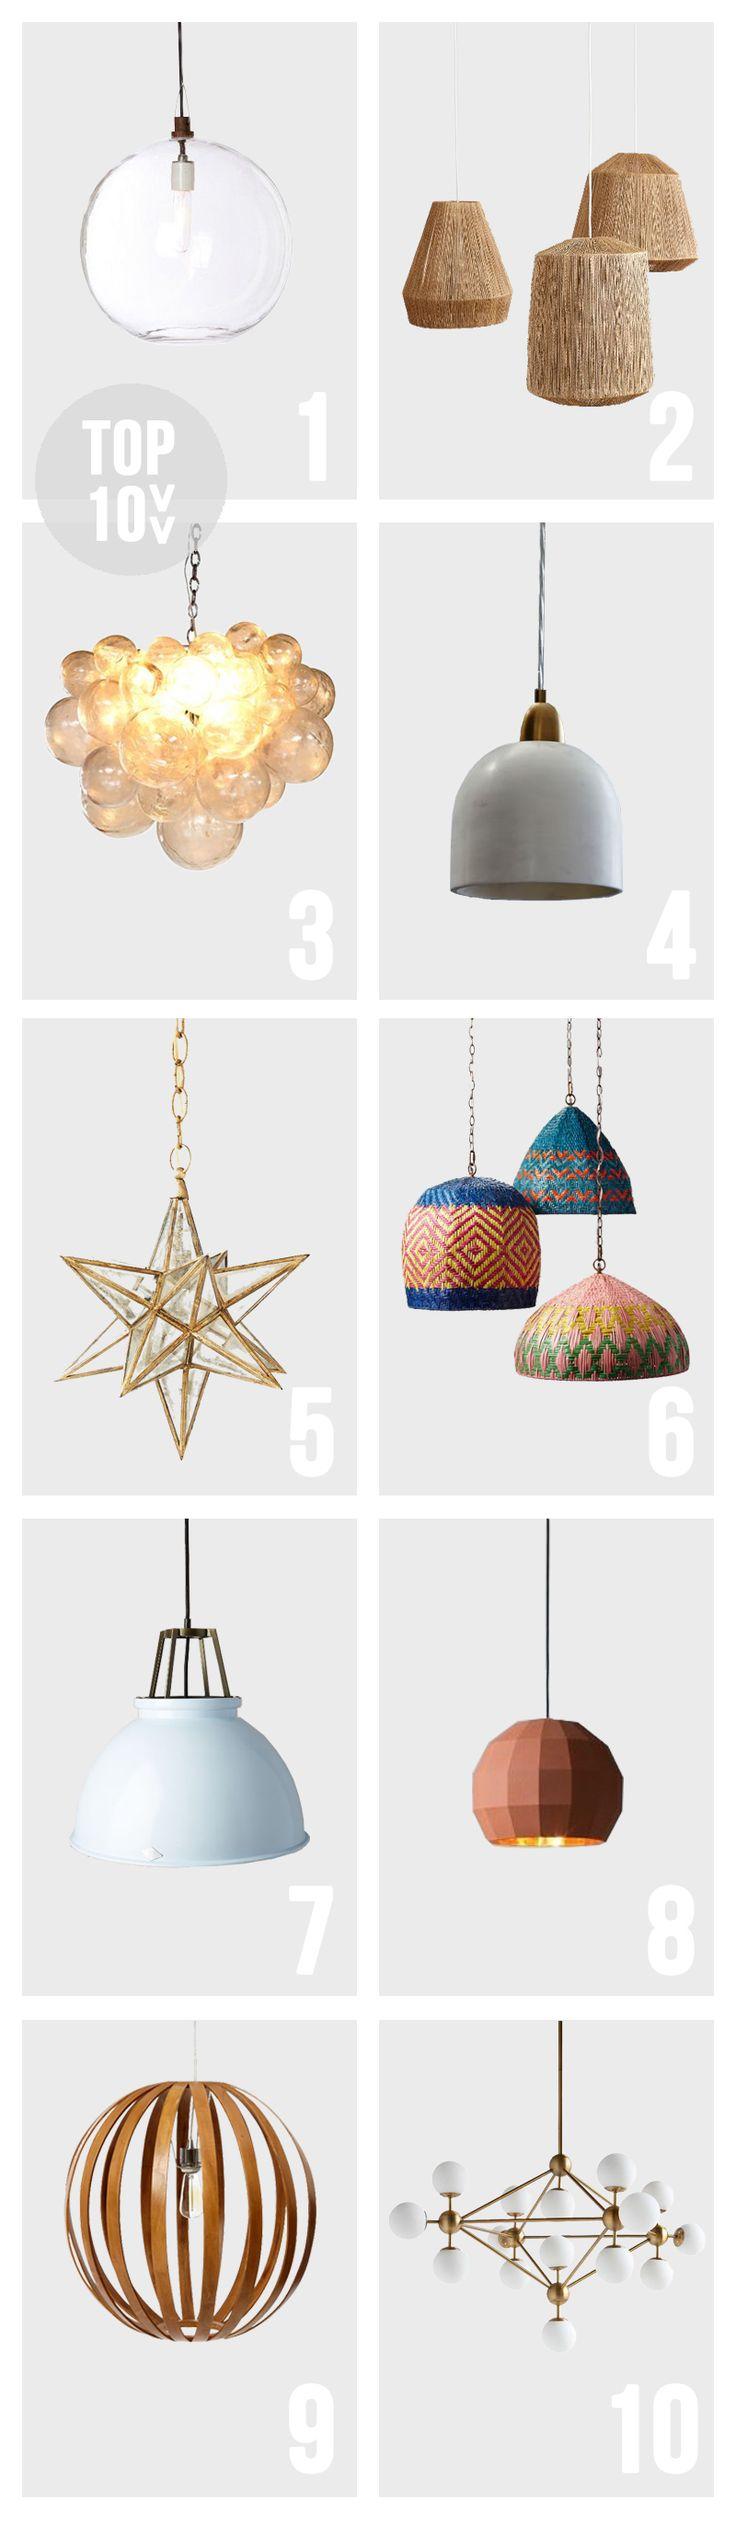 Amber Interiors TOP10 - ALT LIGHTING